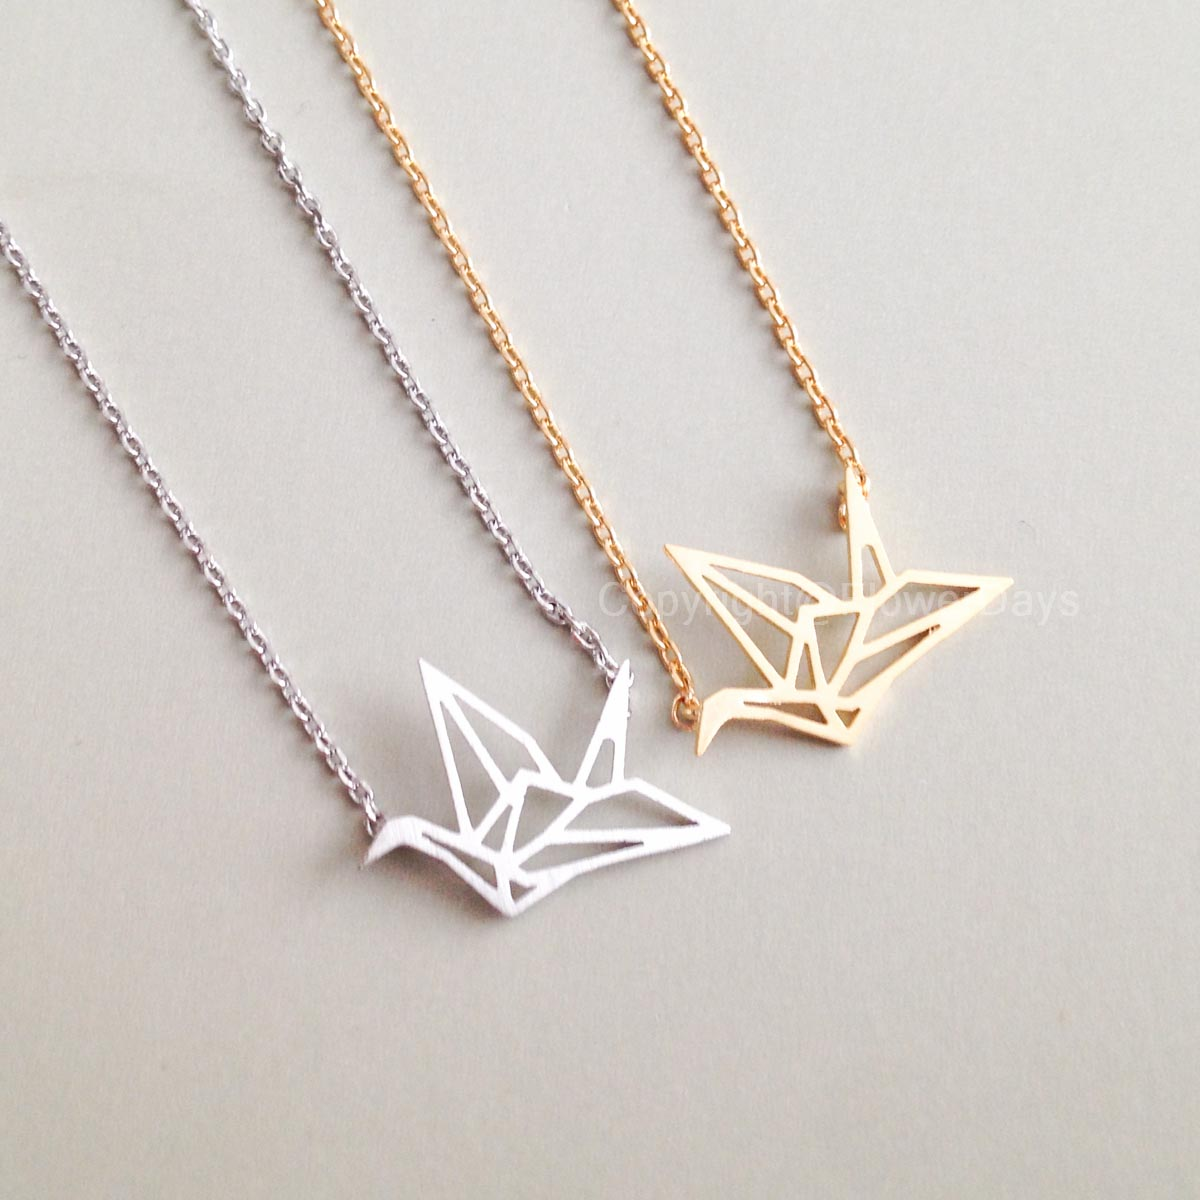 Origami Crane Necklace on Storenvy - photo#8